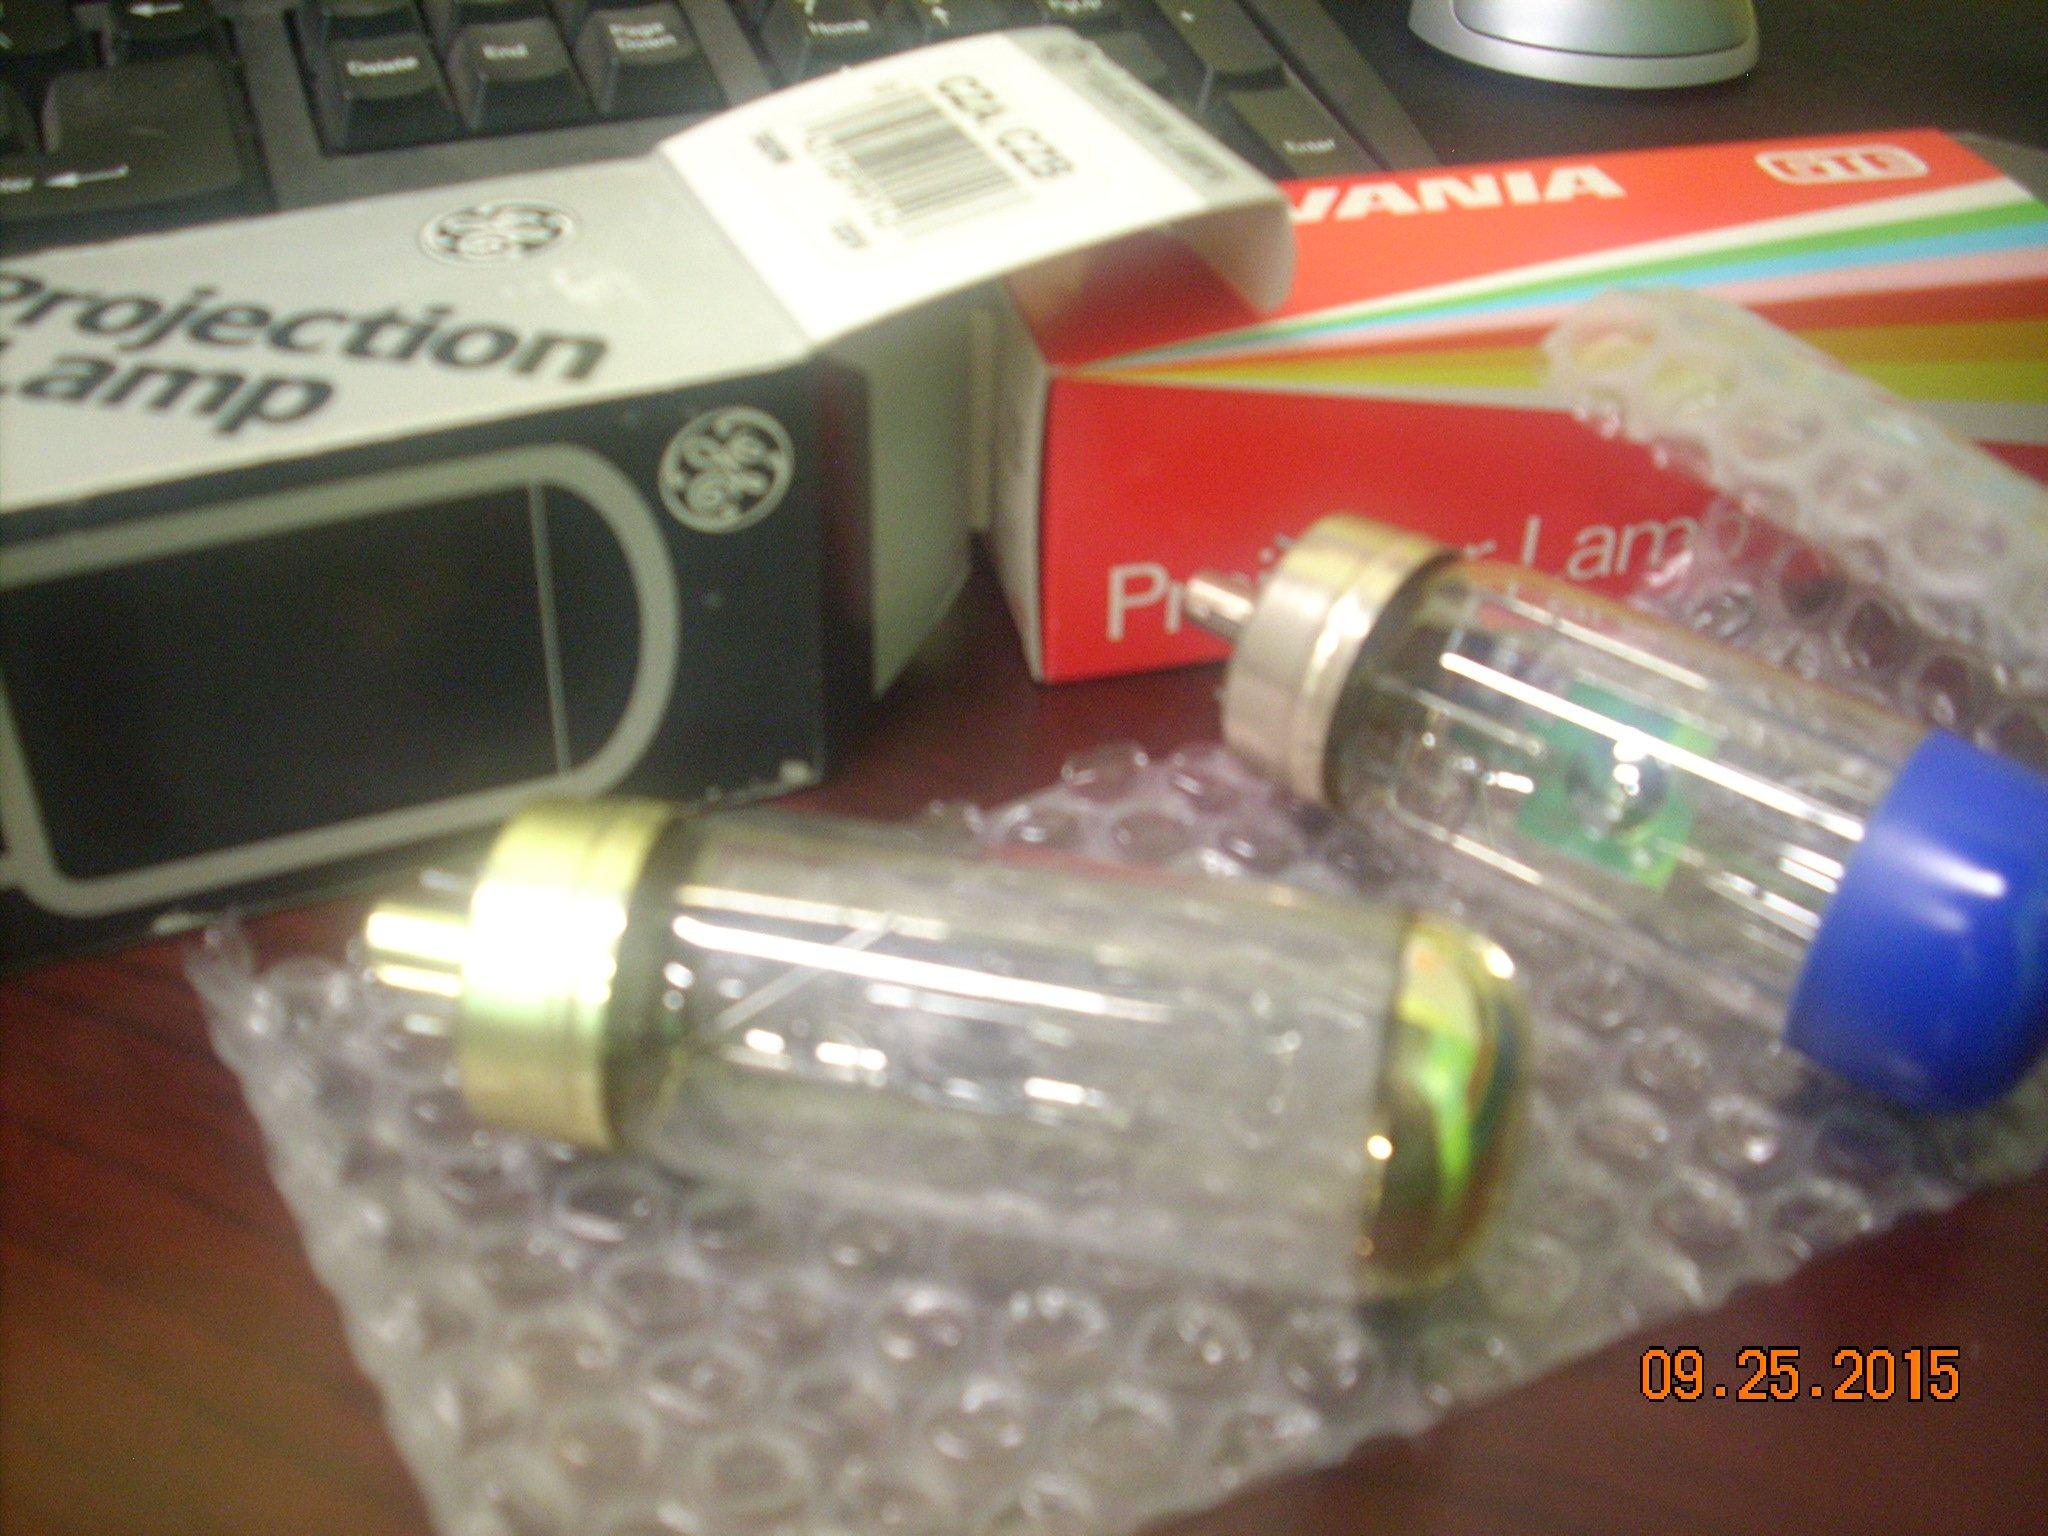 GE 29664 - CZA/CZB Projector Light Bulb